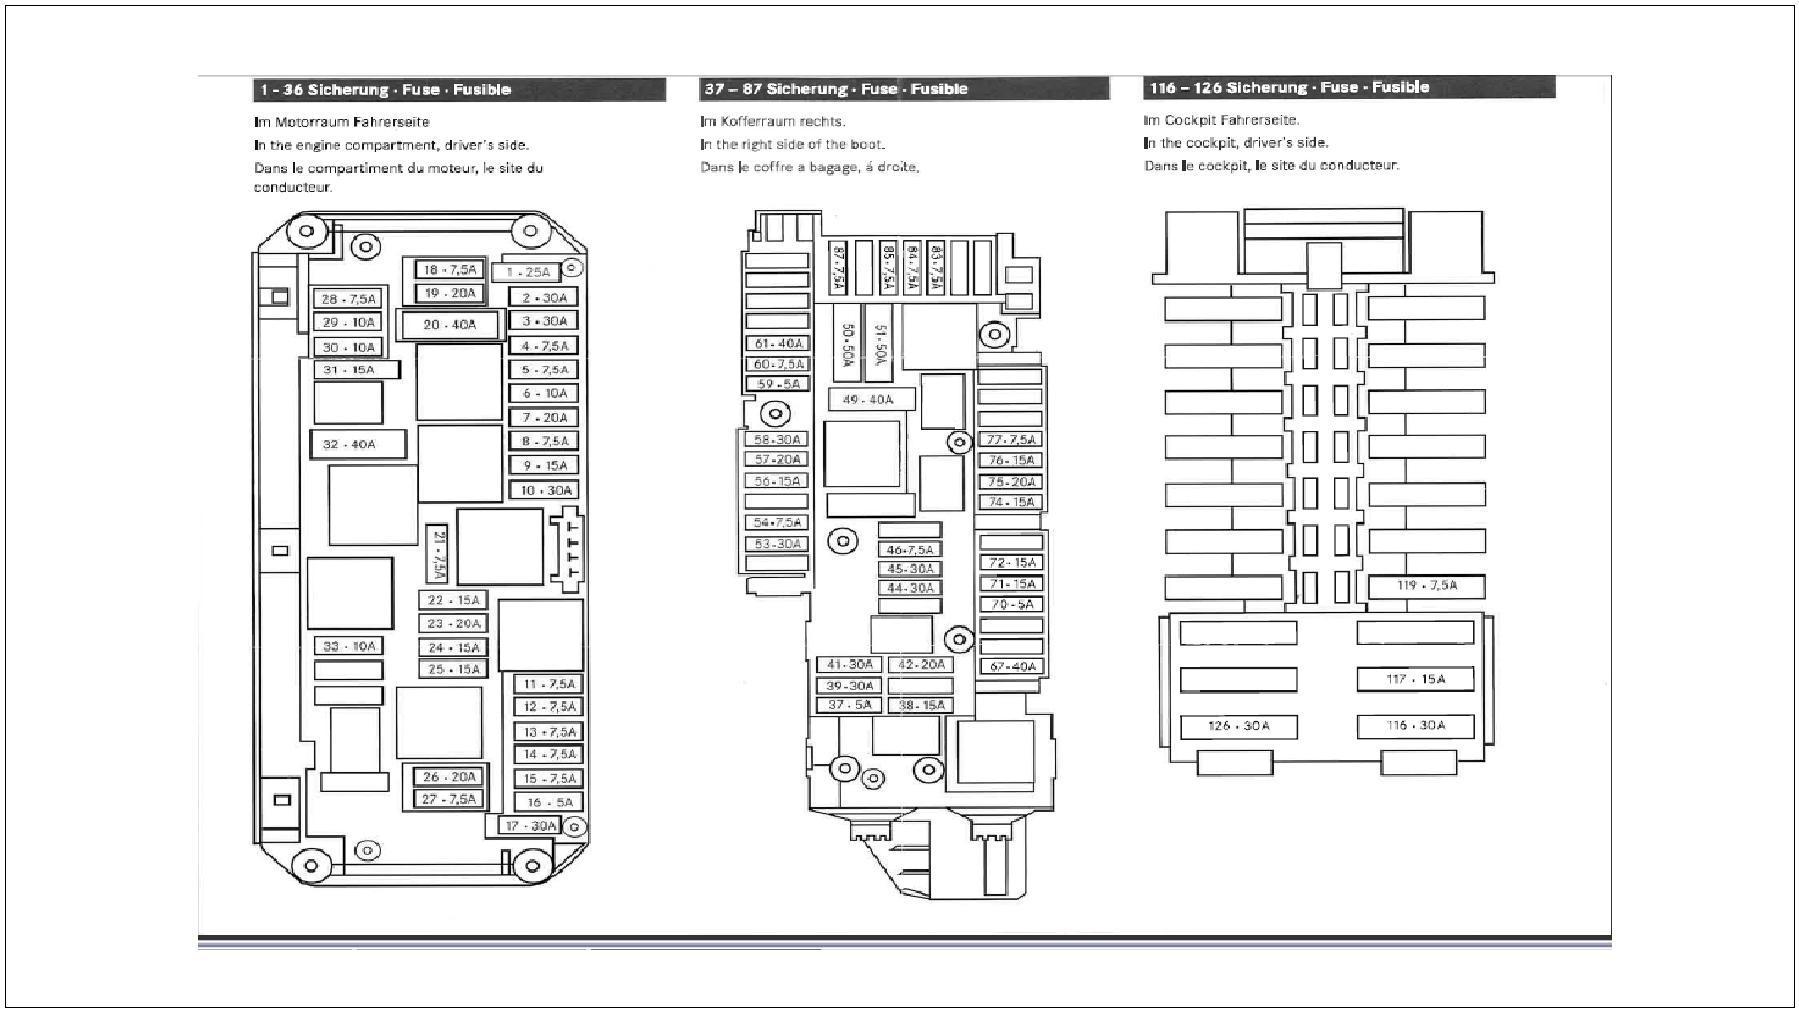 mercedes e550 fuse diagram